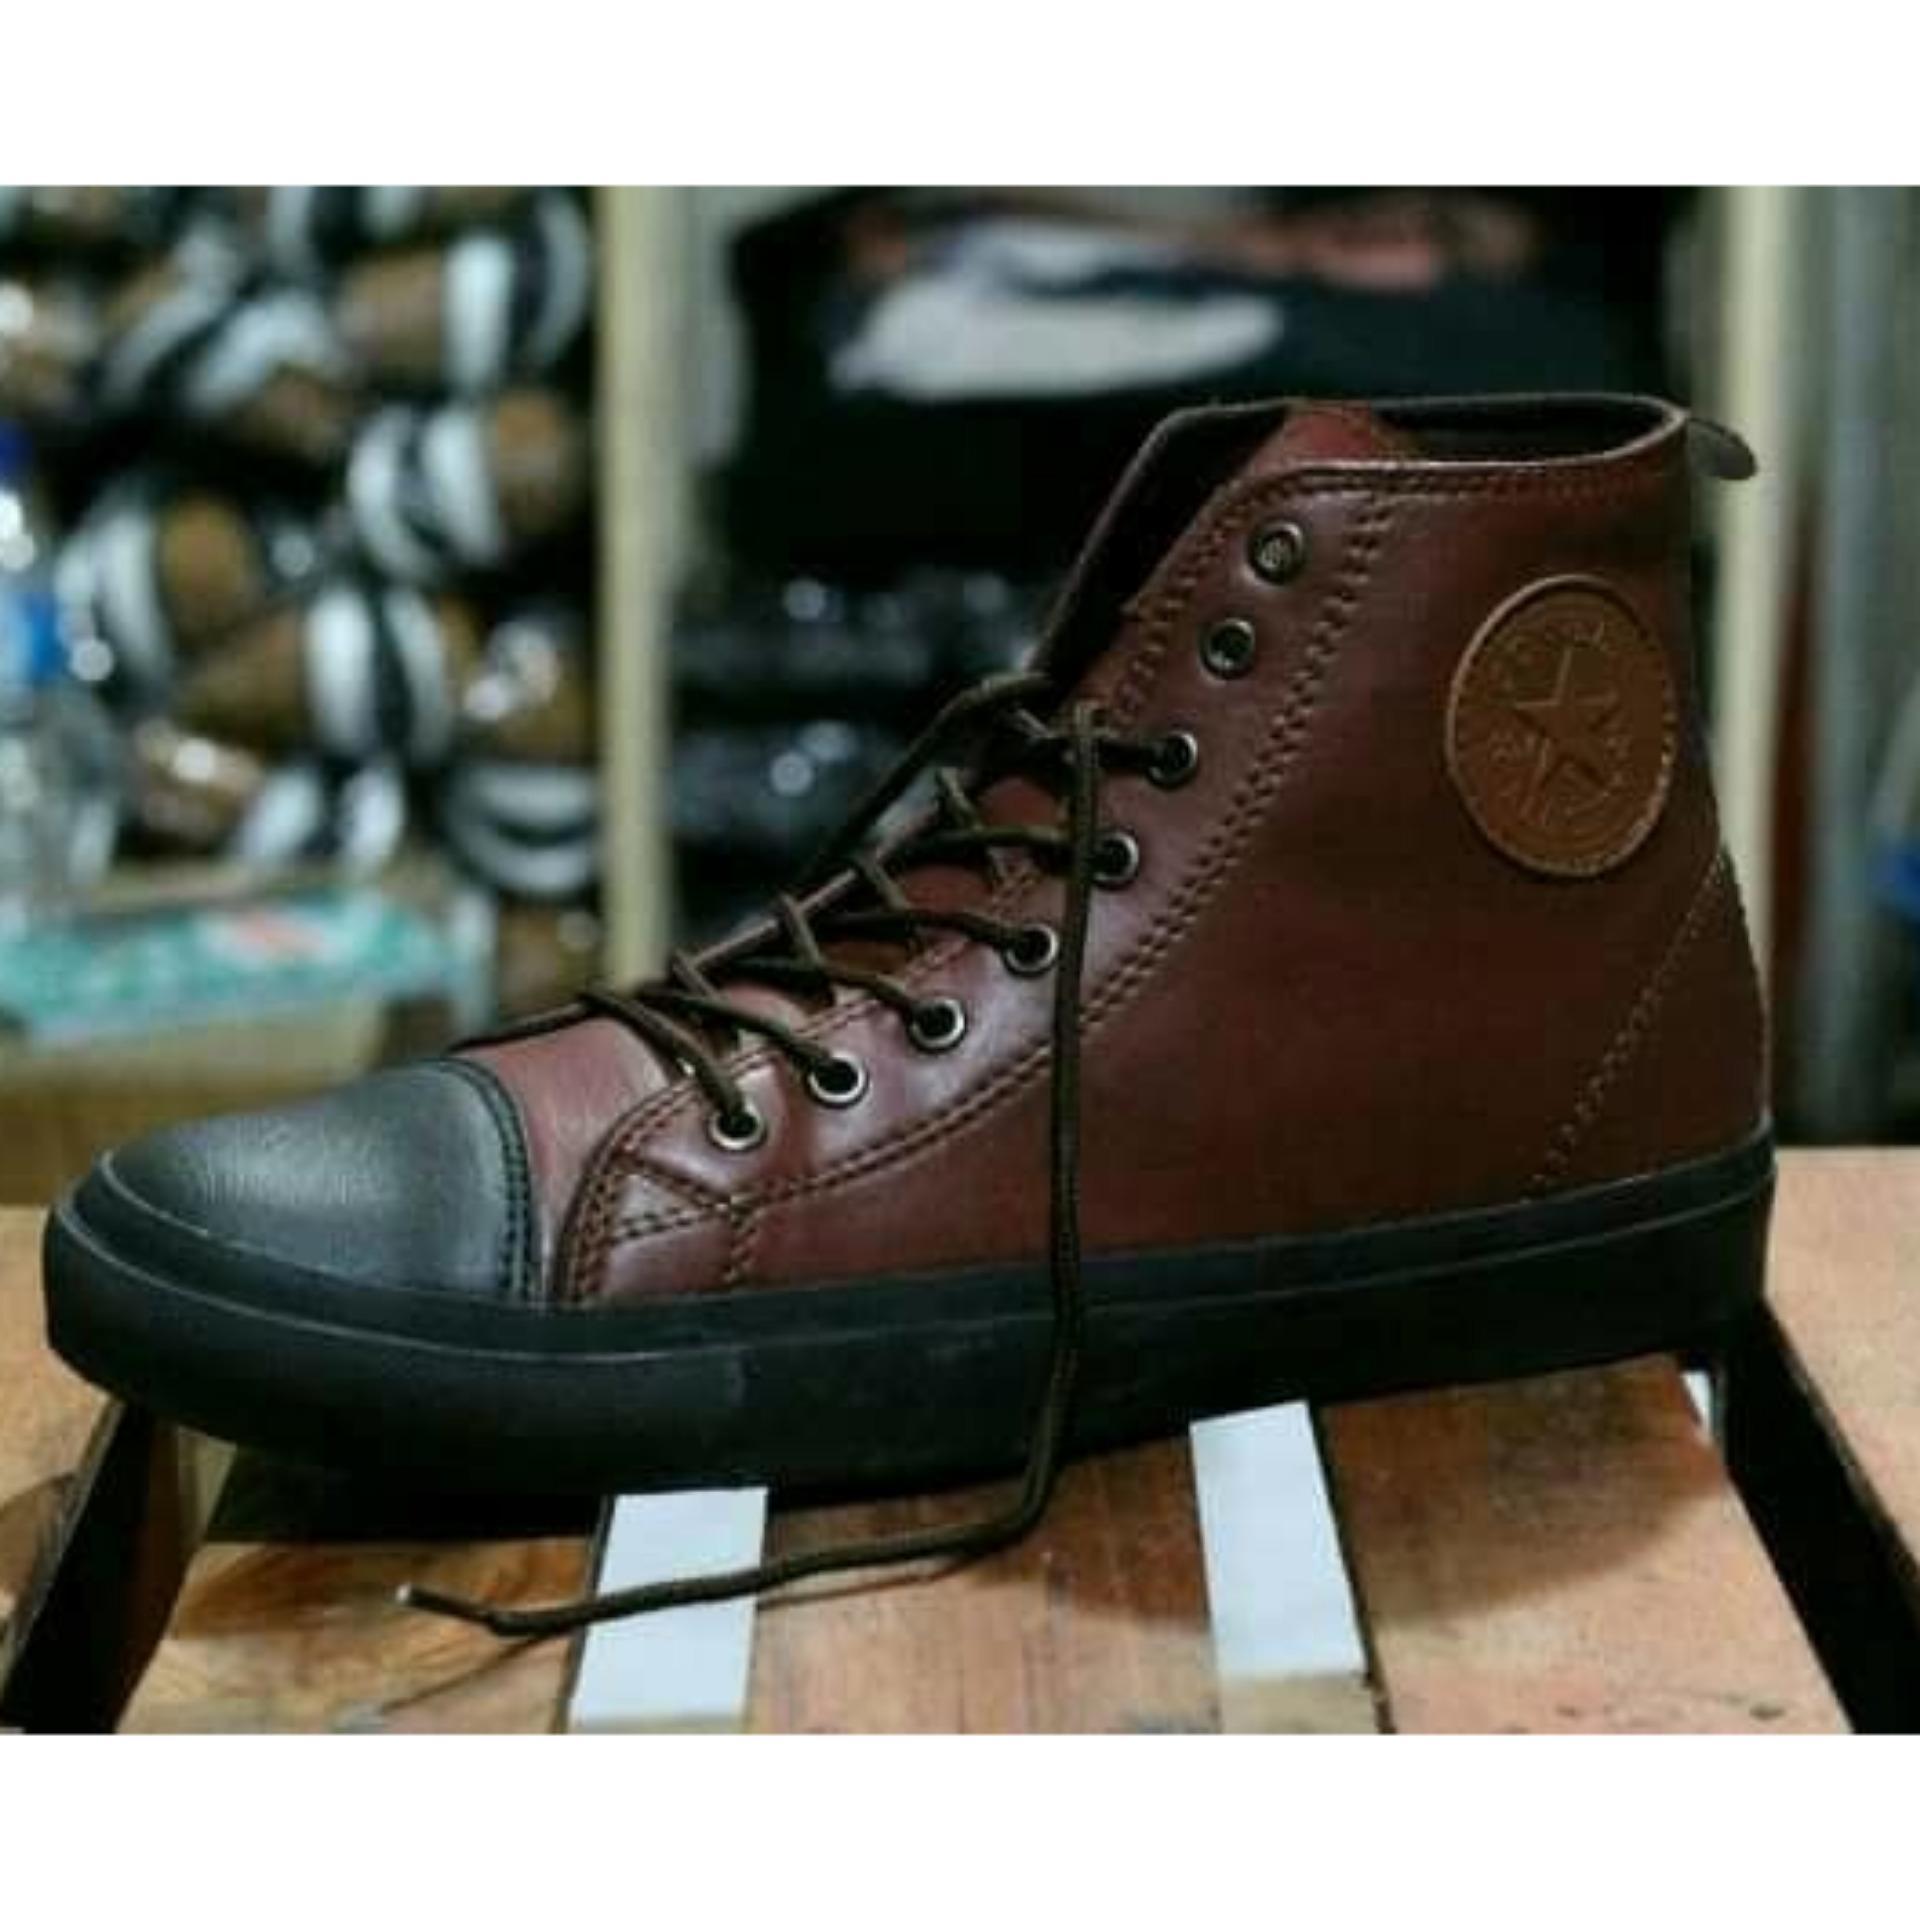 Sepatu Connversee Lokal semi kulit tinggi - Hitam & Dark Coklat